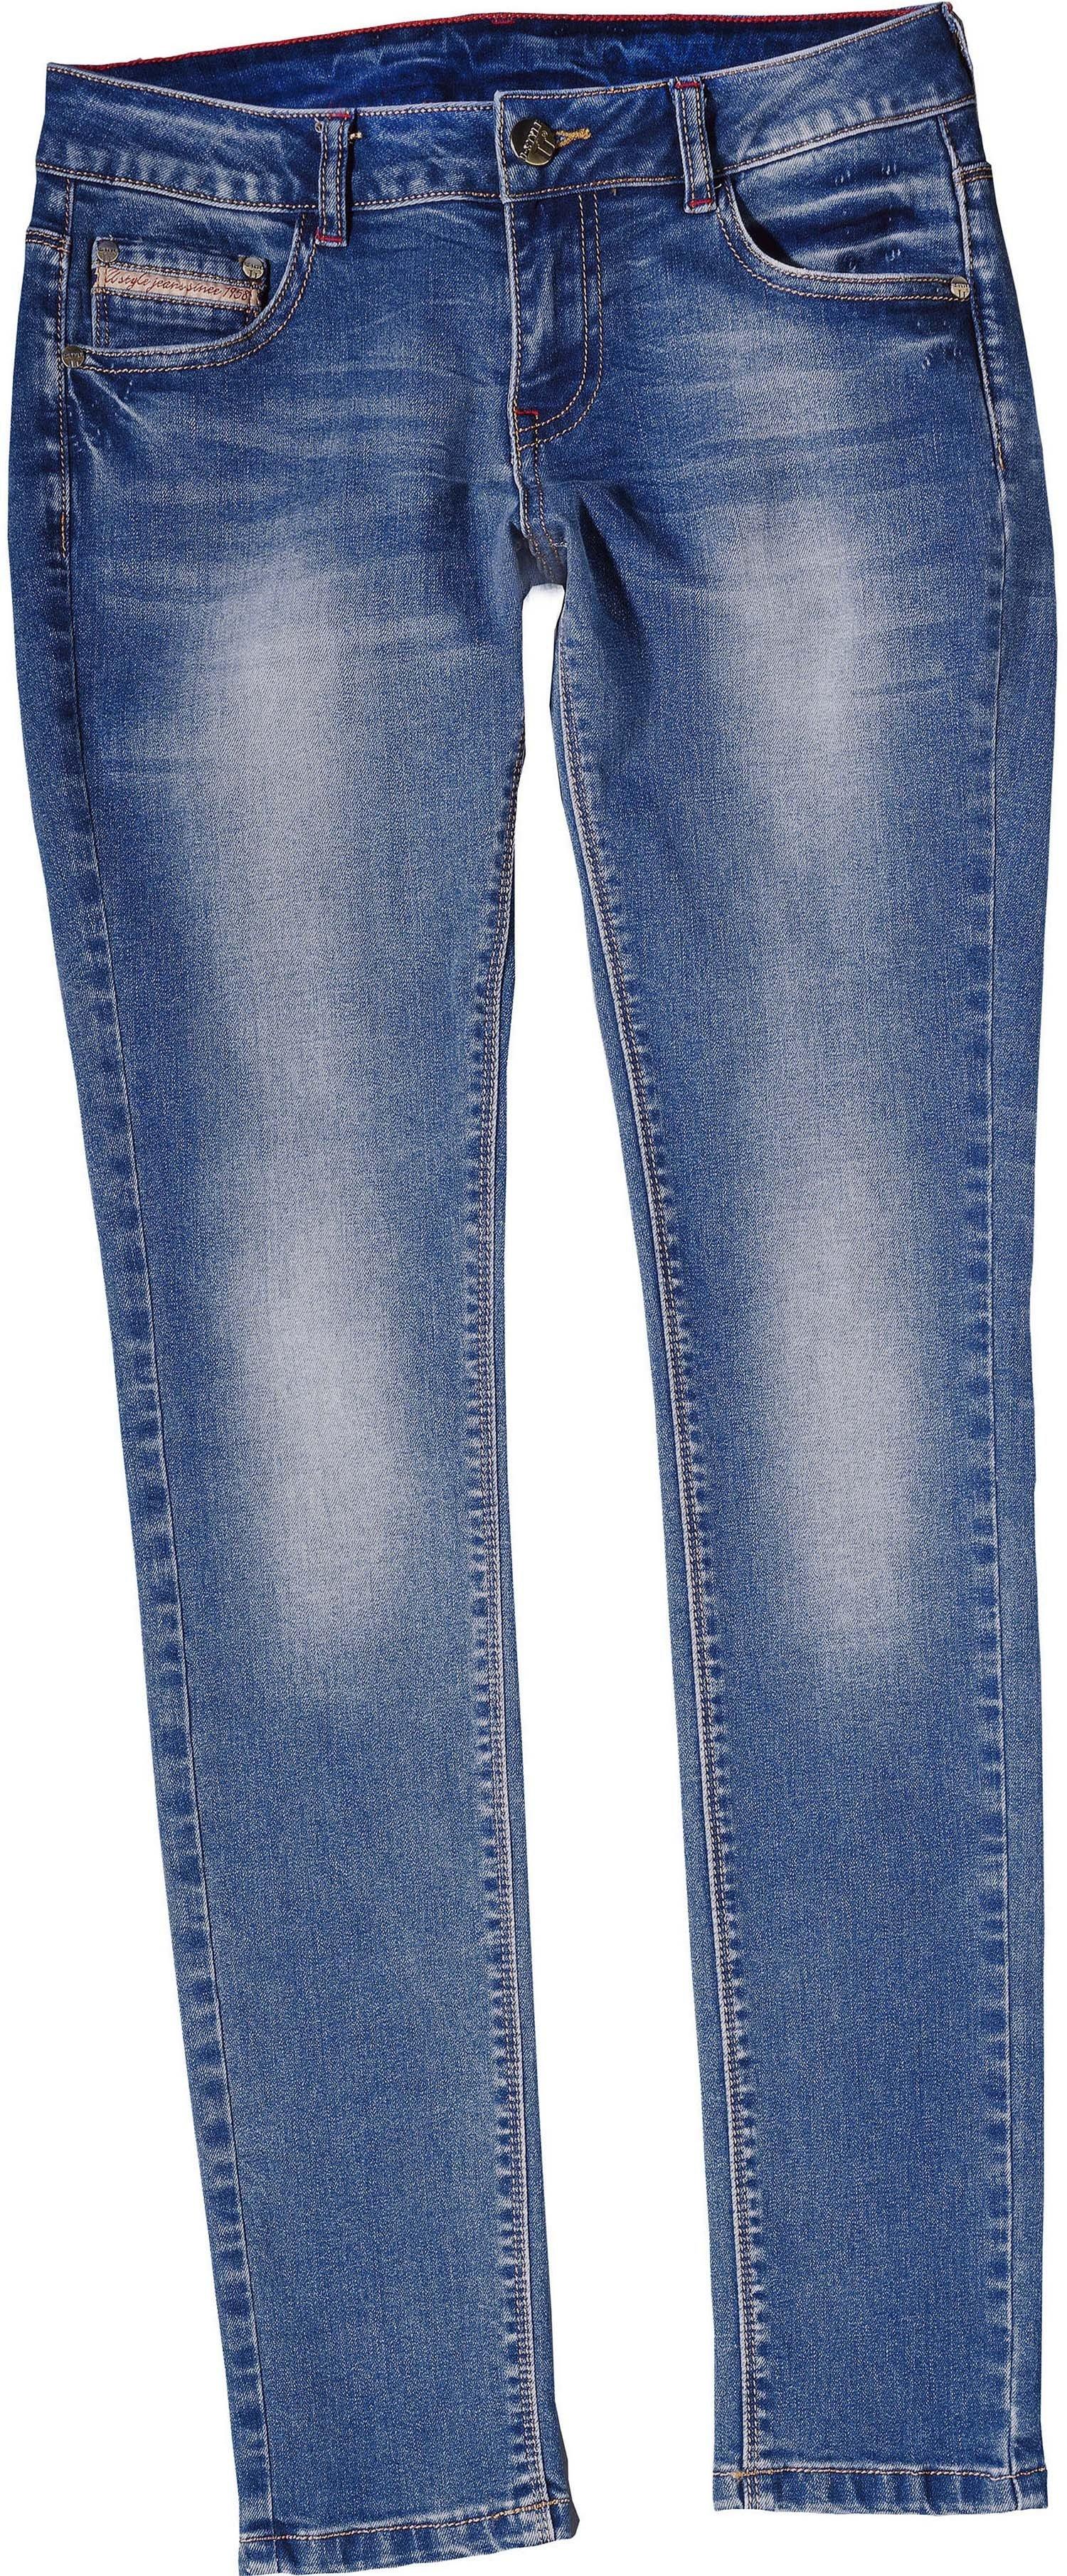 D-Jeans,sand-w.Blue-Denim 44 050 - 2 - Ronja.ch